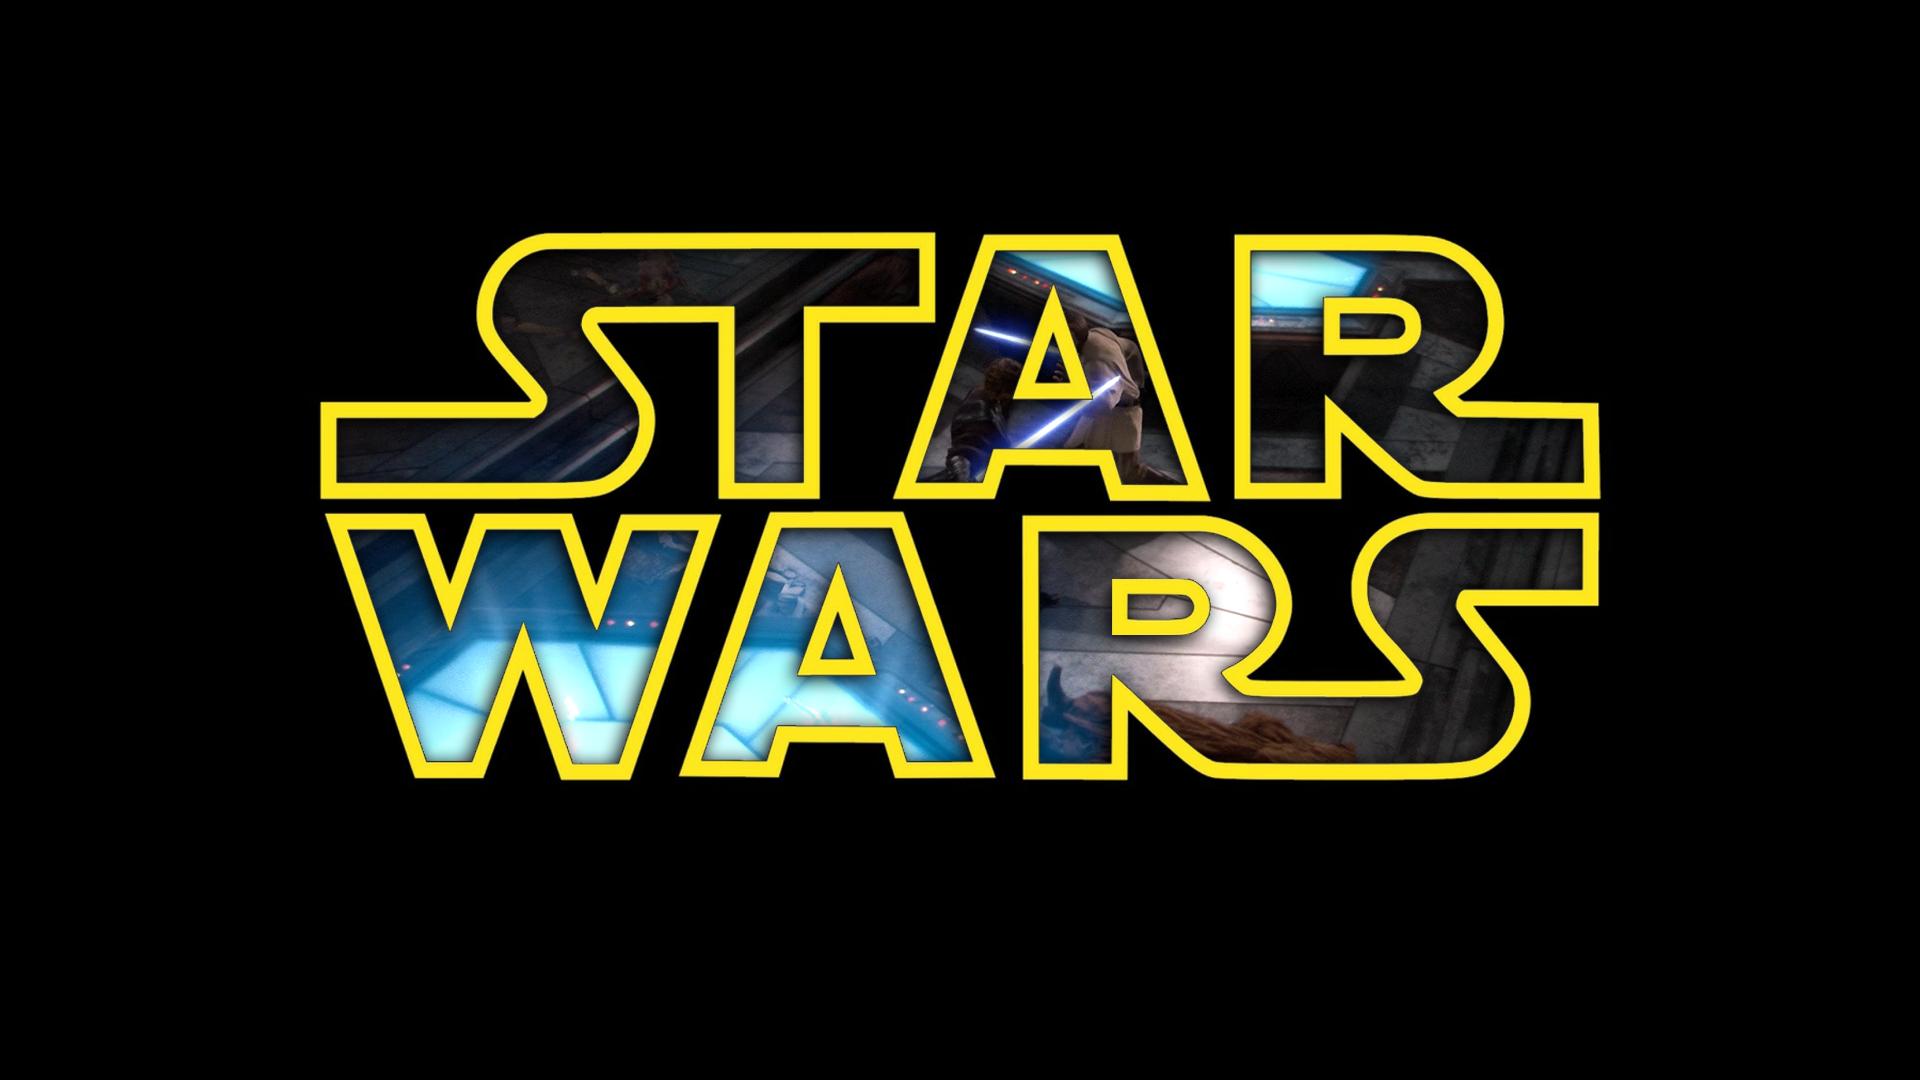 Wallpaper Star Wars Black Background Typography Text Logo